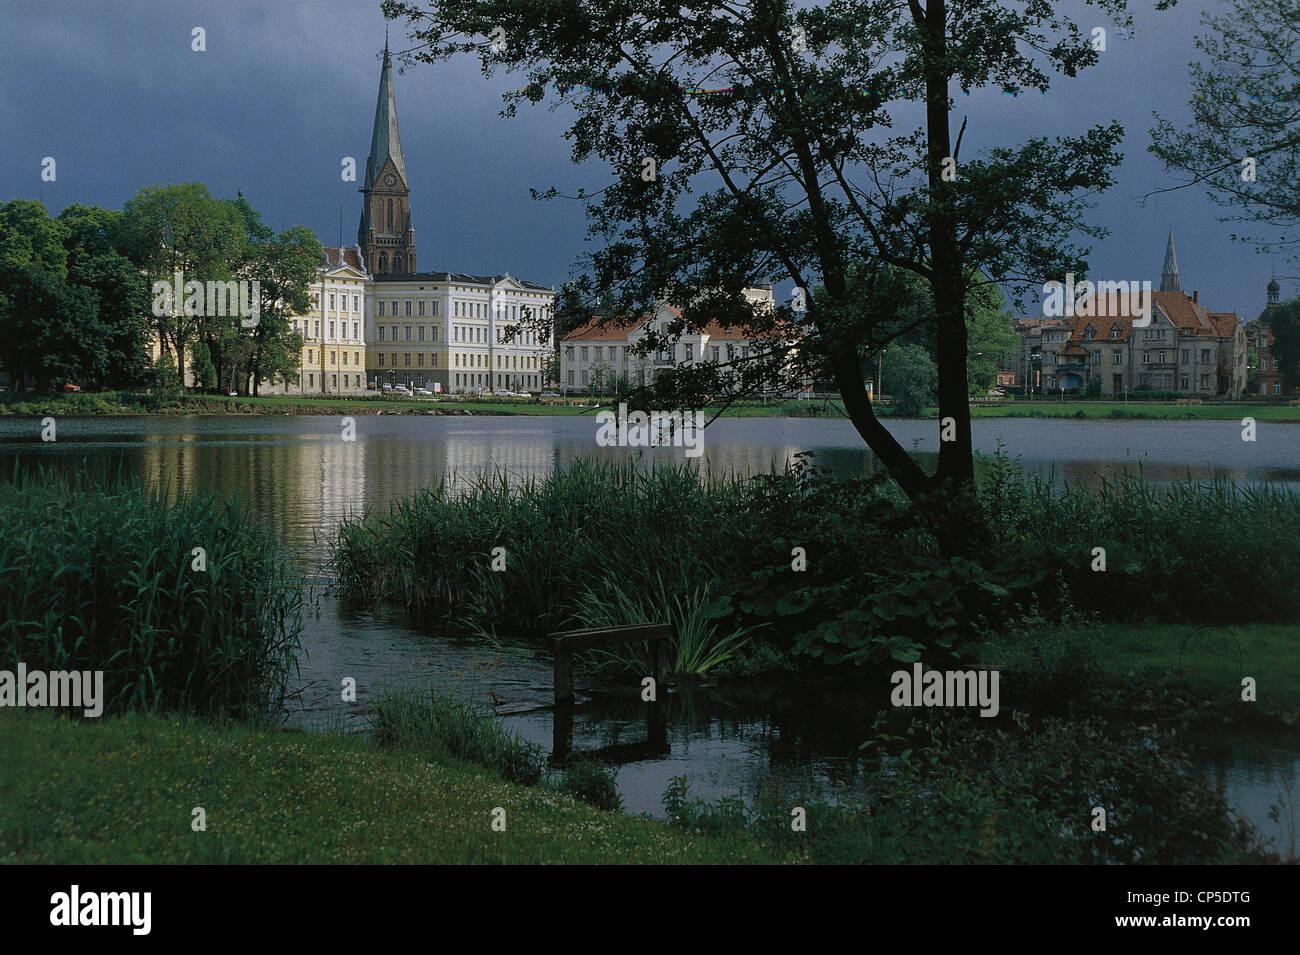 Germany - Mecklenburg Western Pomerania - Schwerin - Stock Image